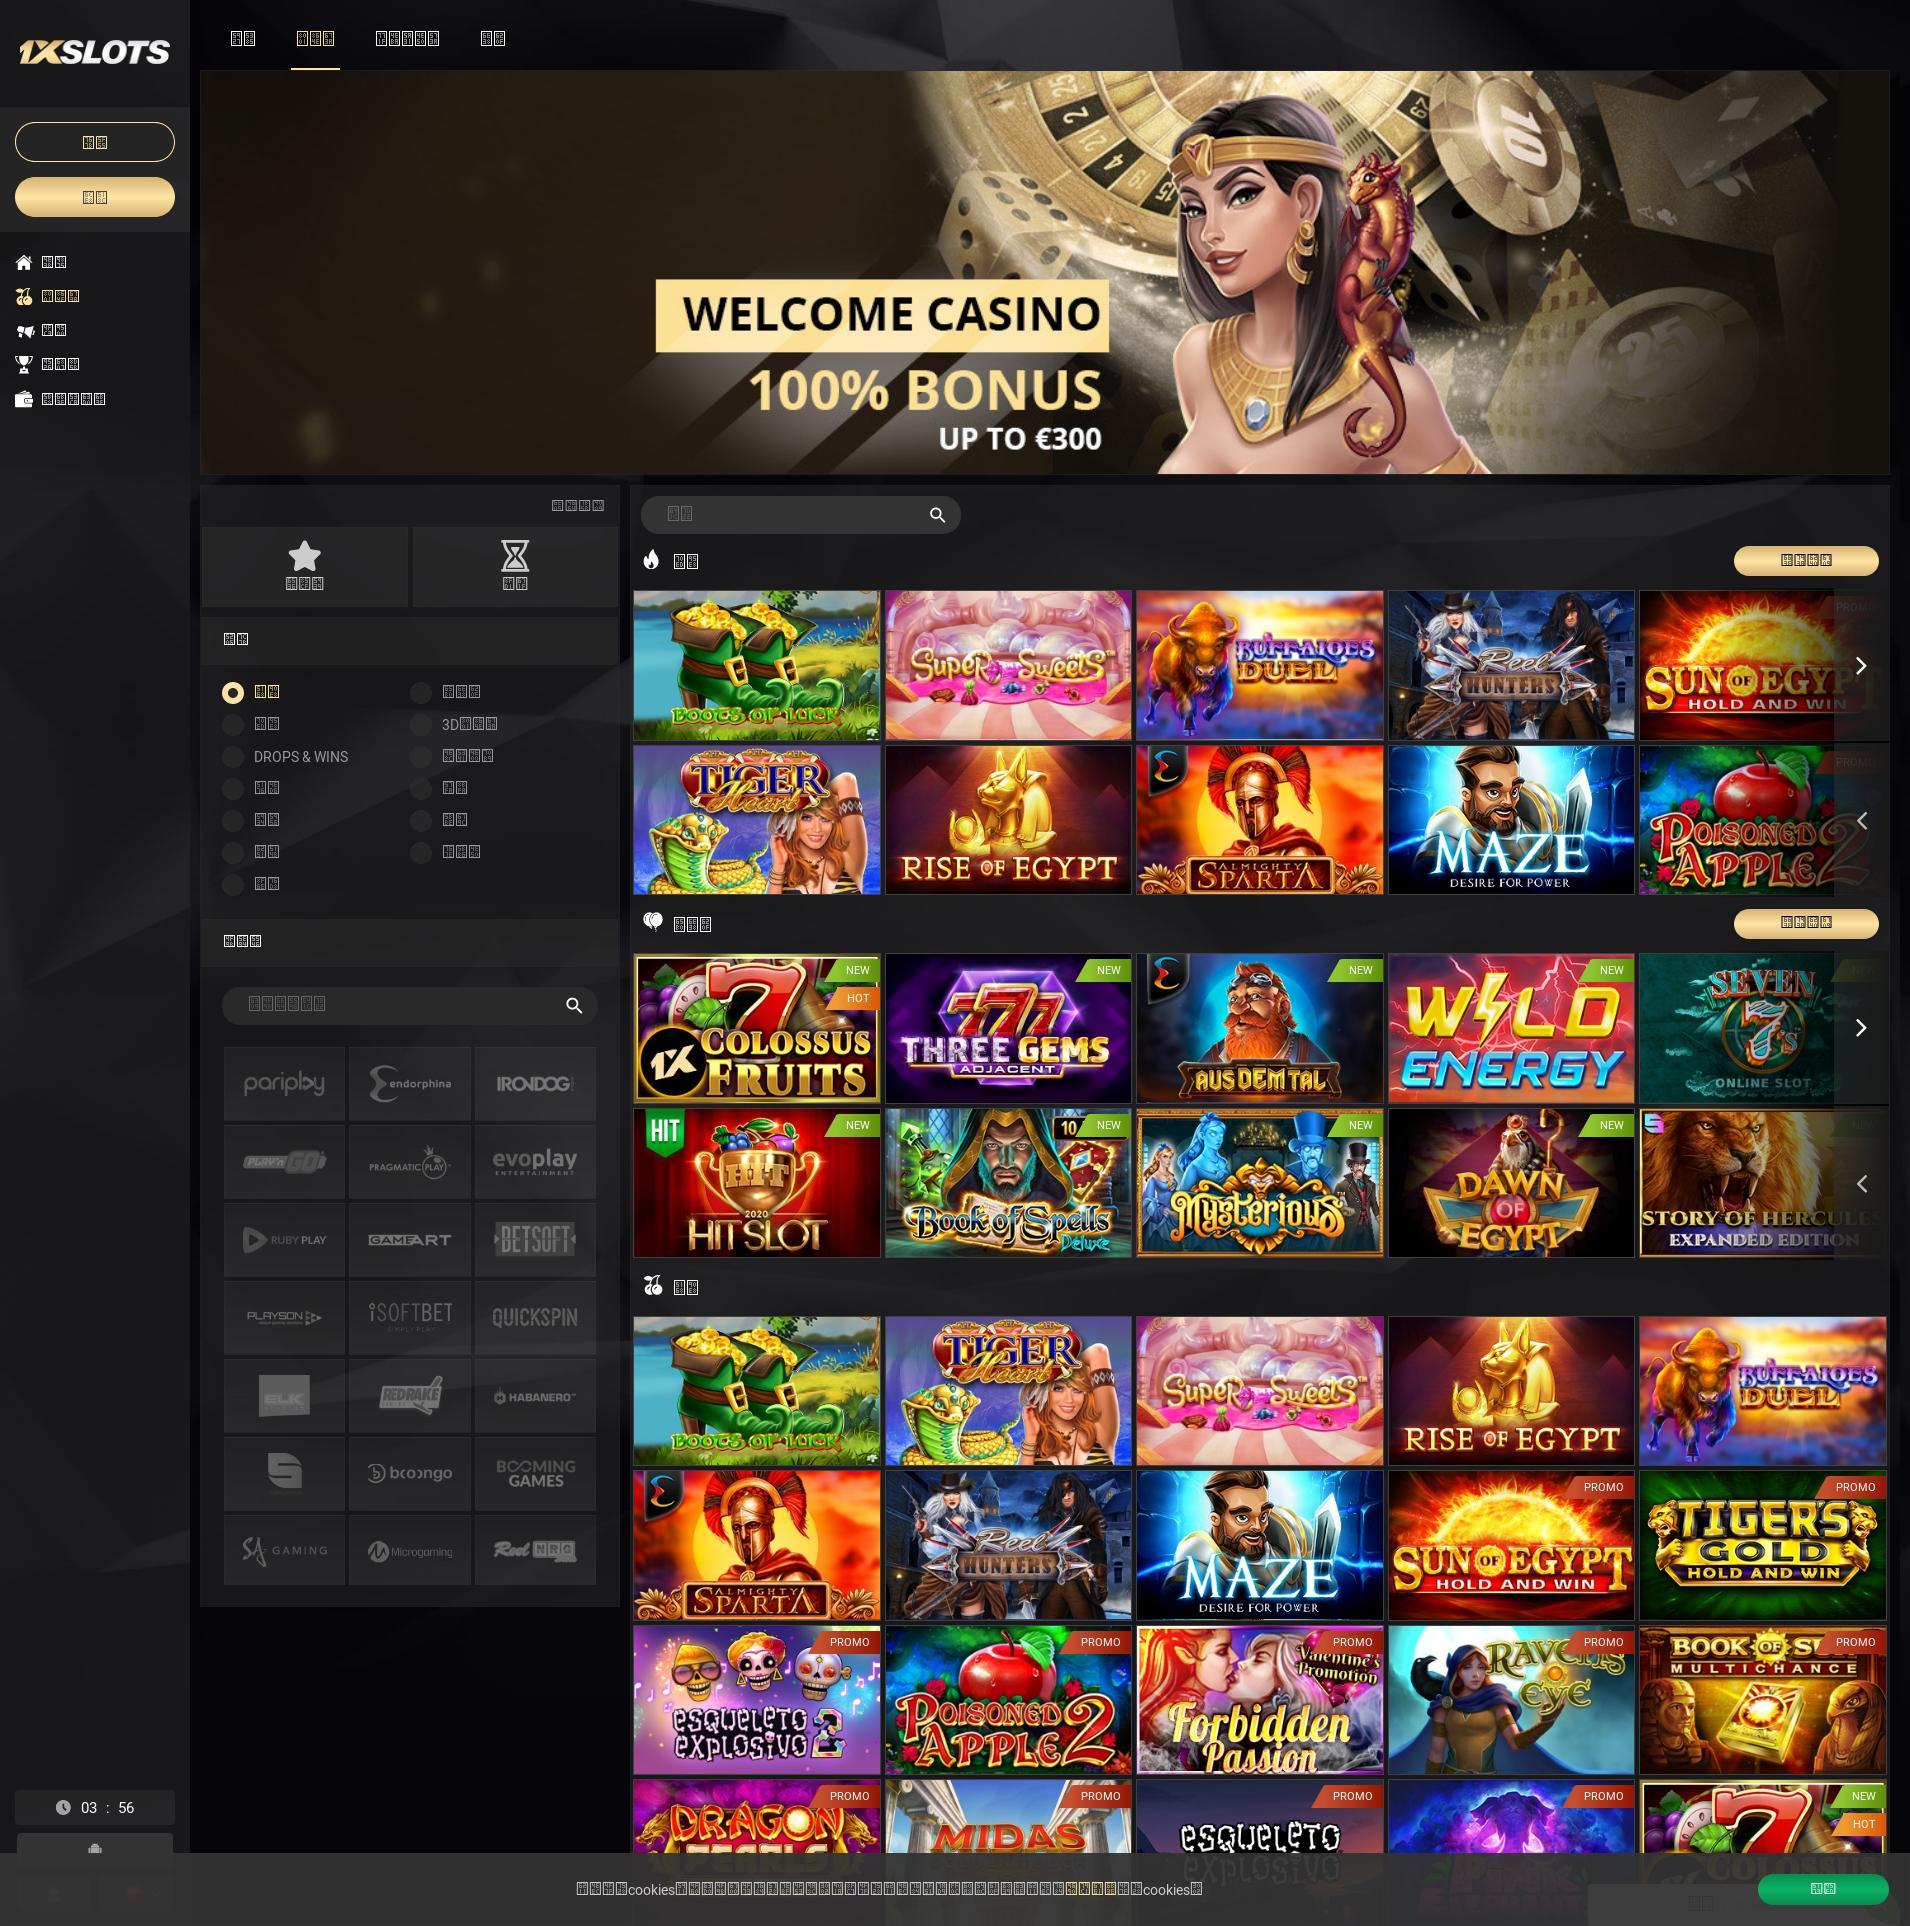 Casino screen Lobby 2020-02-21 for China